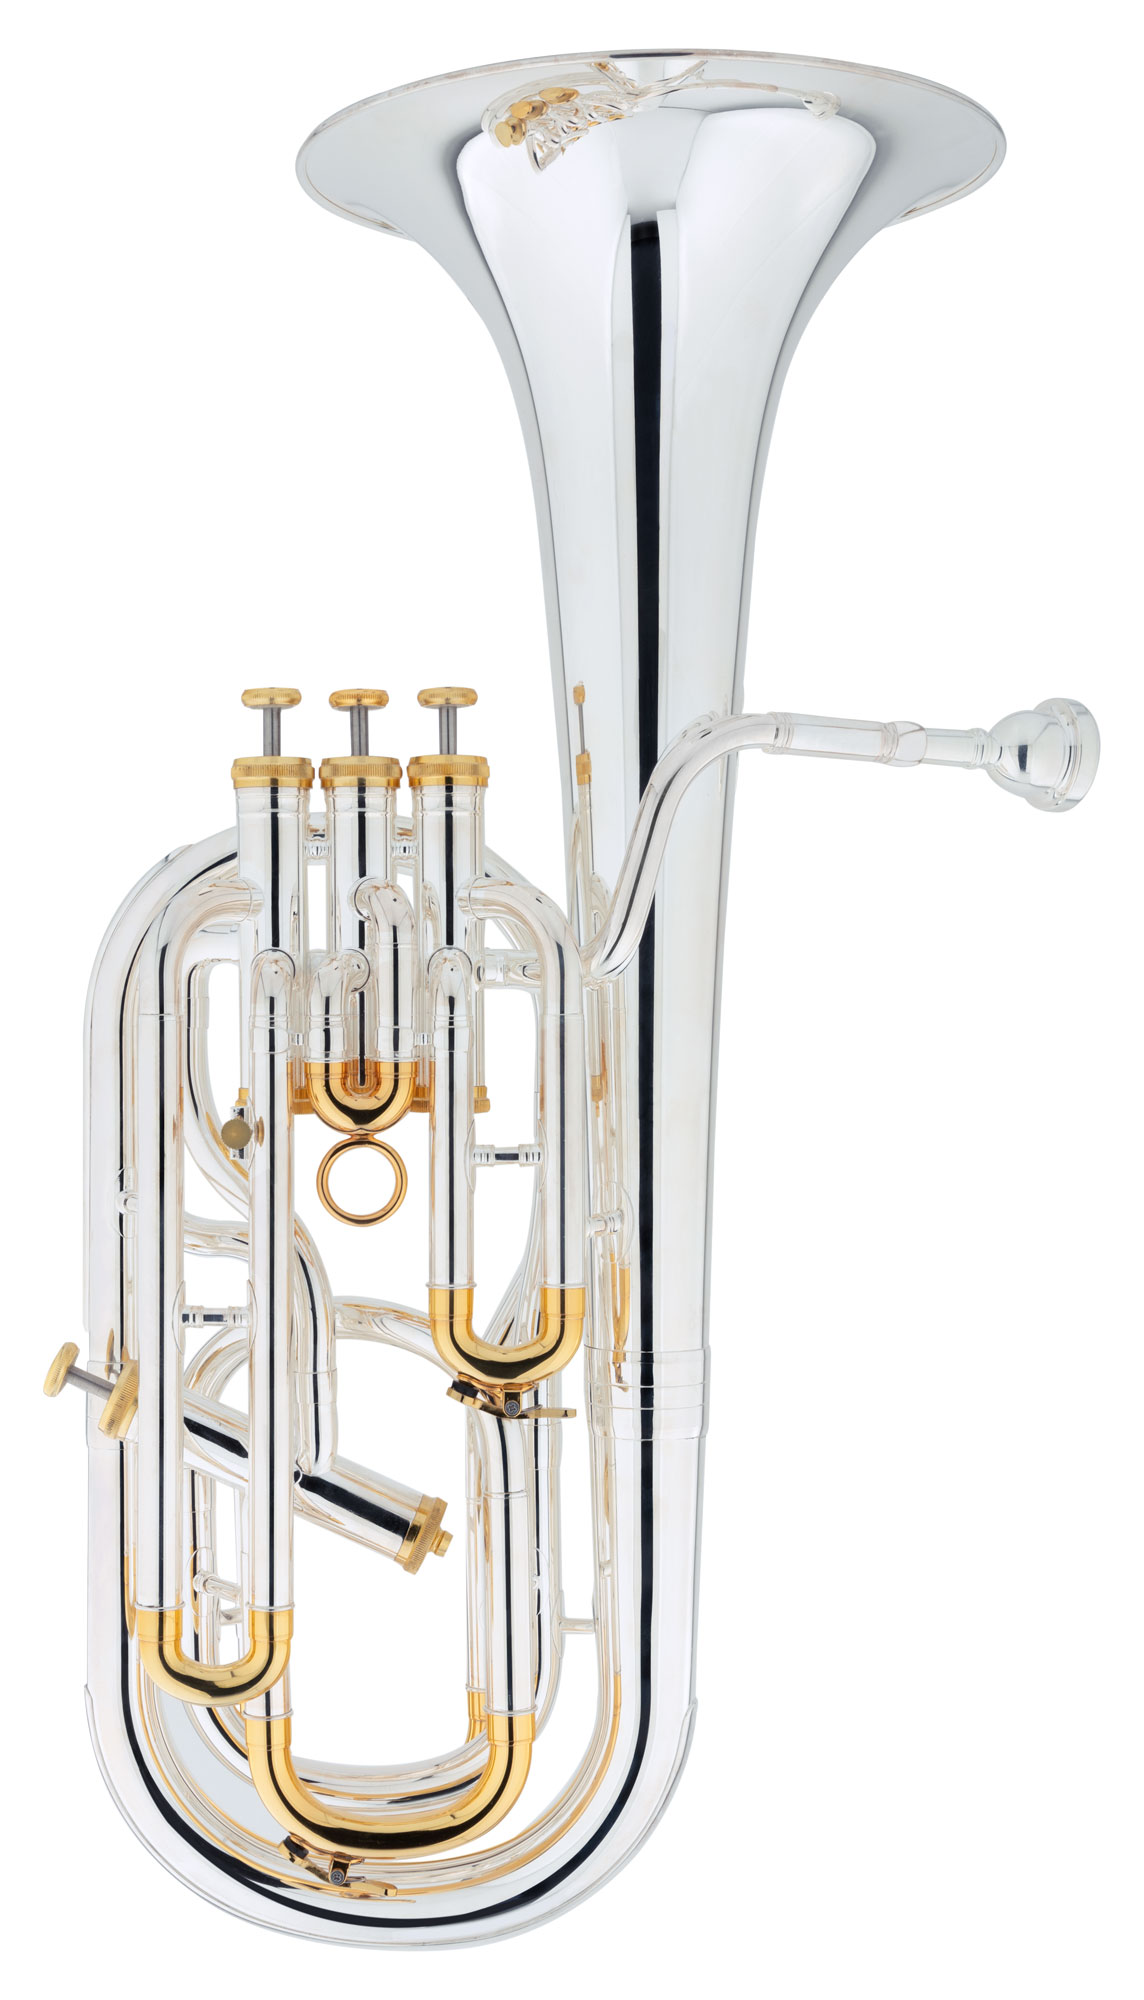 Baritone - Lechgold Supreme BH 231 Bb Bariton versilbert - Onlineshop Musikhaus Kirstein